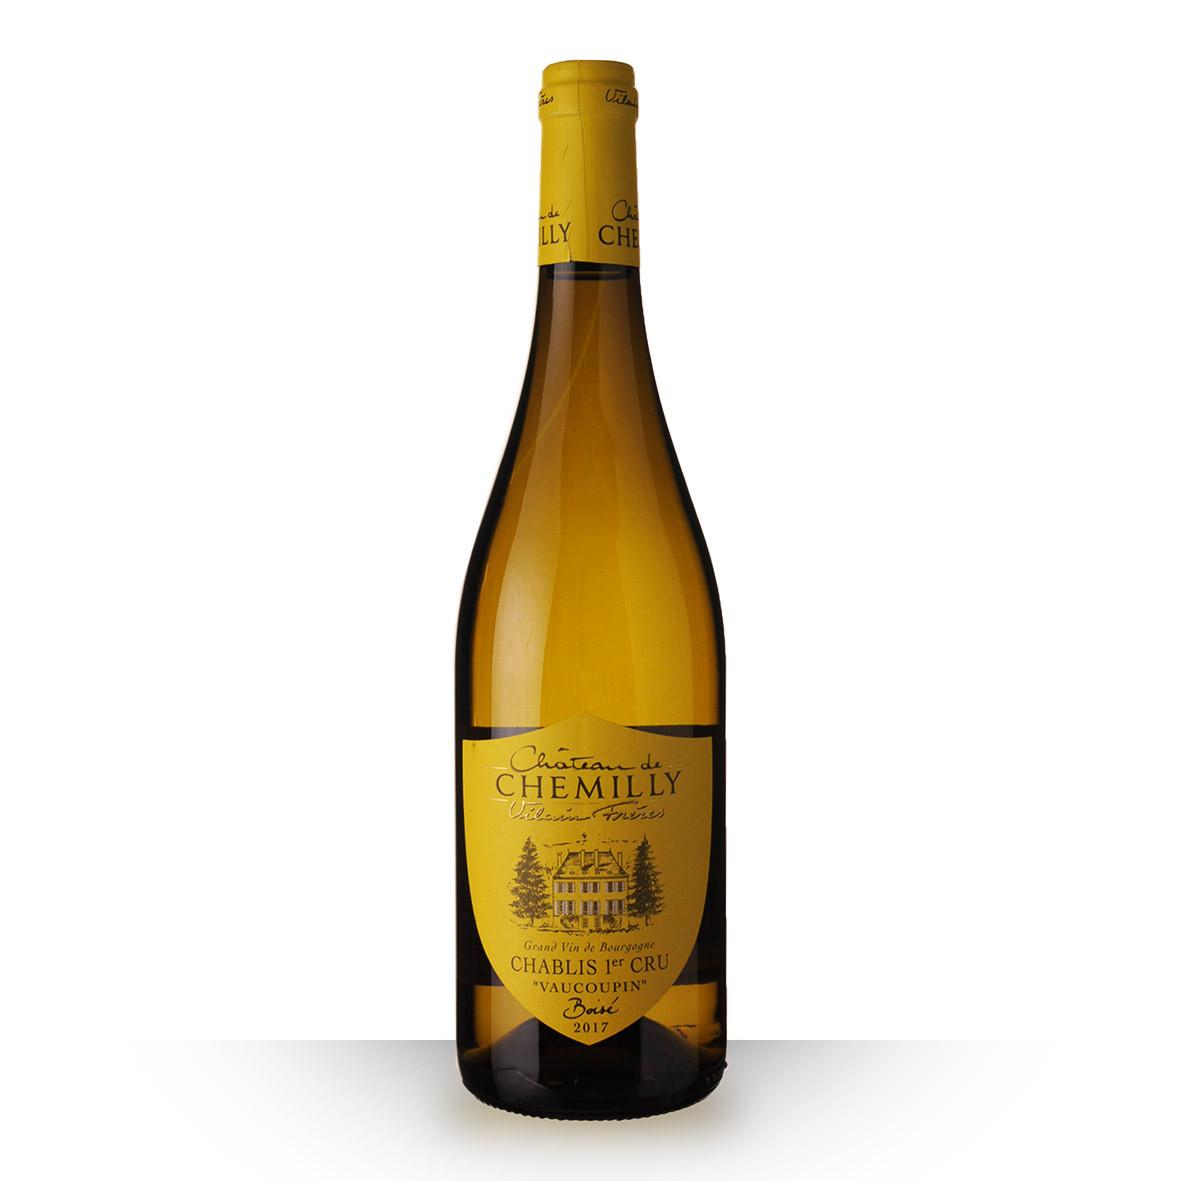 Château de Chemilly Chablis 1er Cru Vaucoupin Blanc 2017 75cl www.odyssee-vins.com